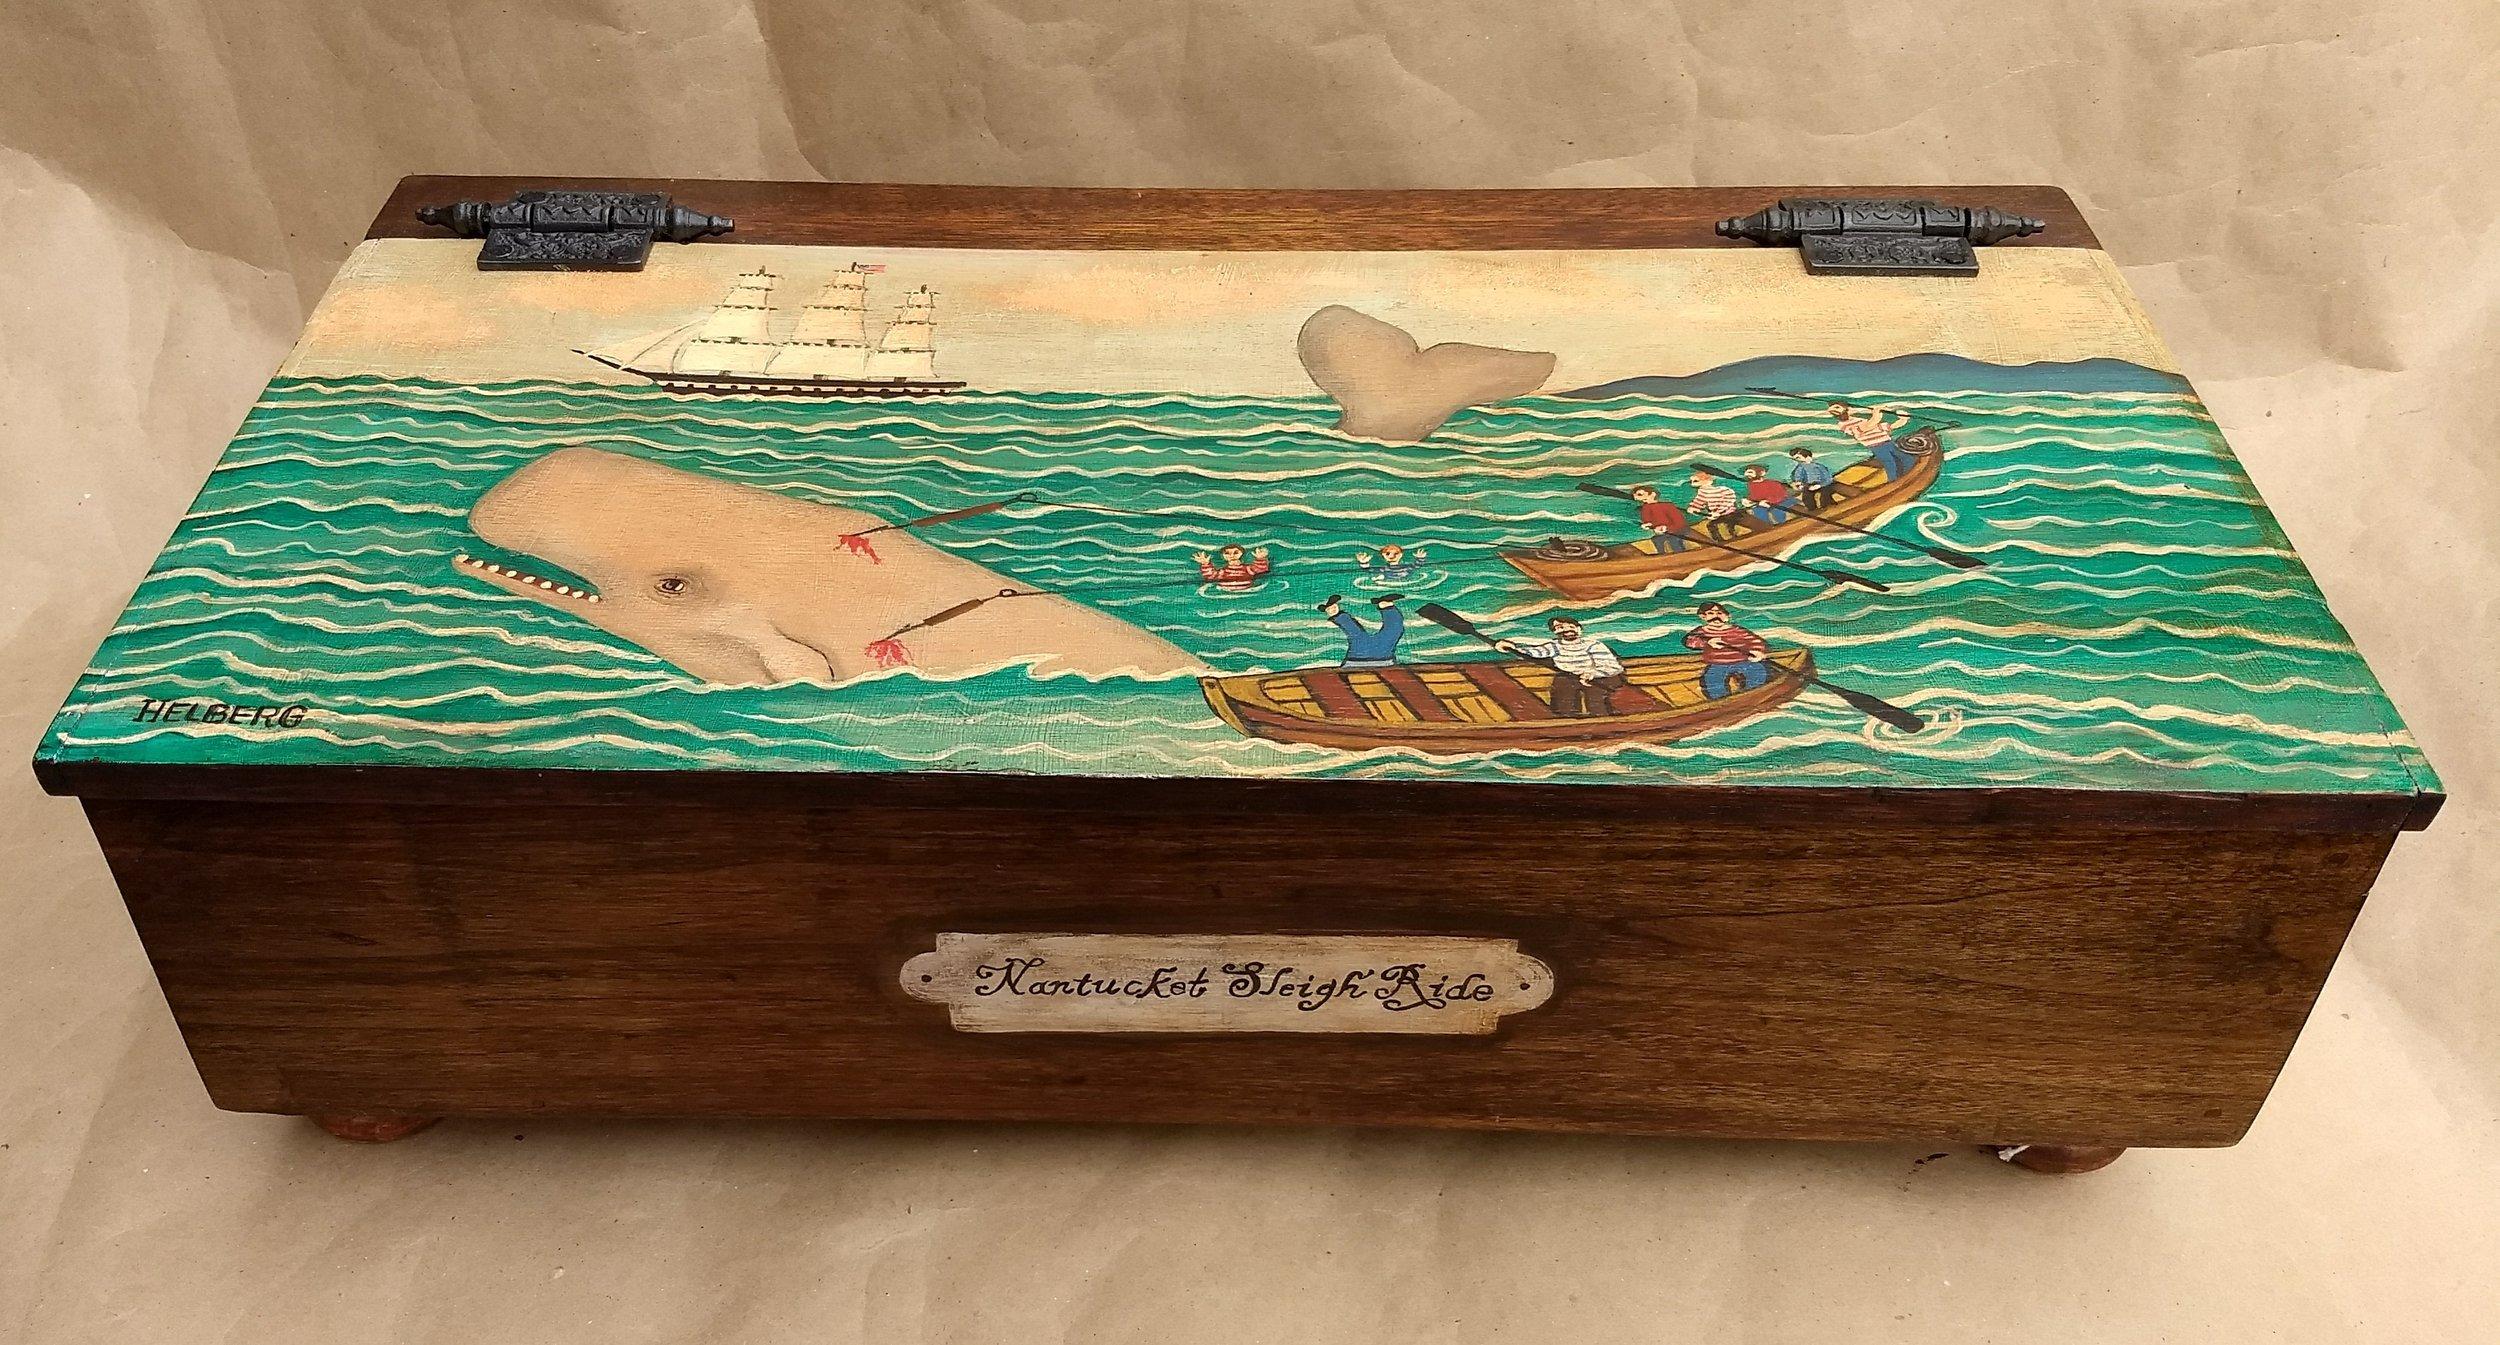 Nantucket Sleigh Ride  c Kristin Helberg 2018 old oak barn box